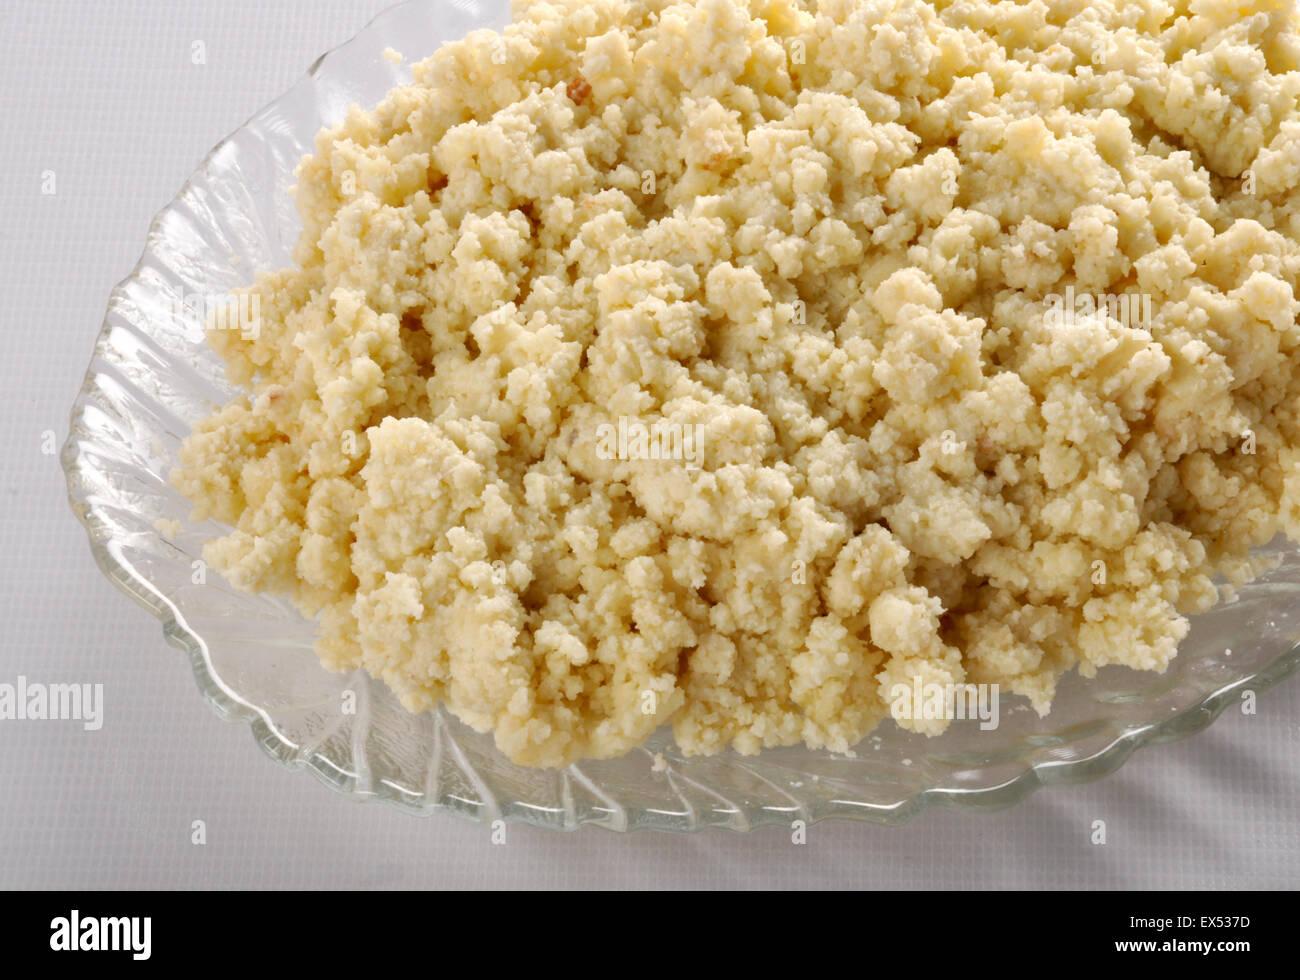 Khoya Milk Solid - Stock Image